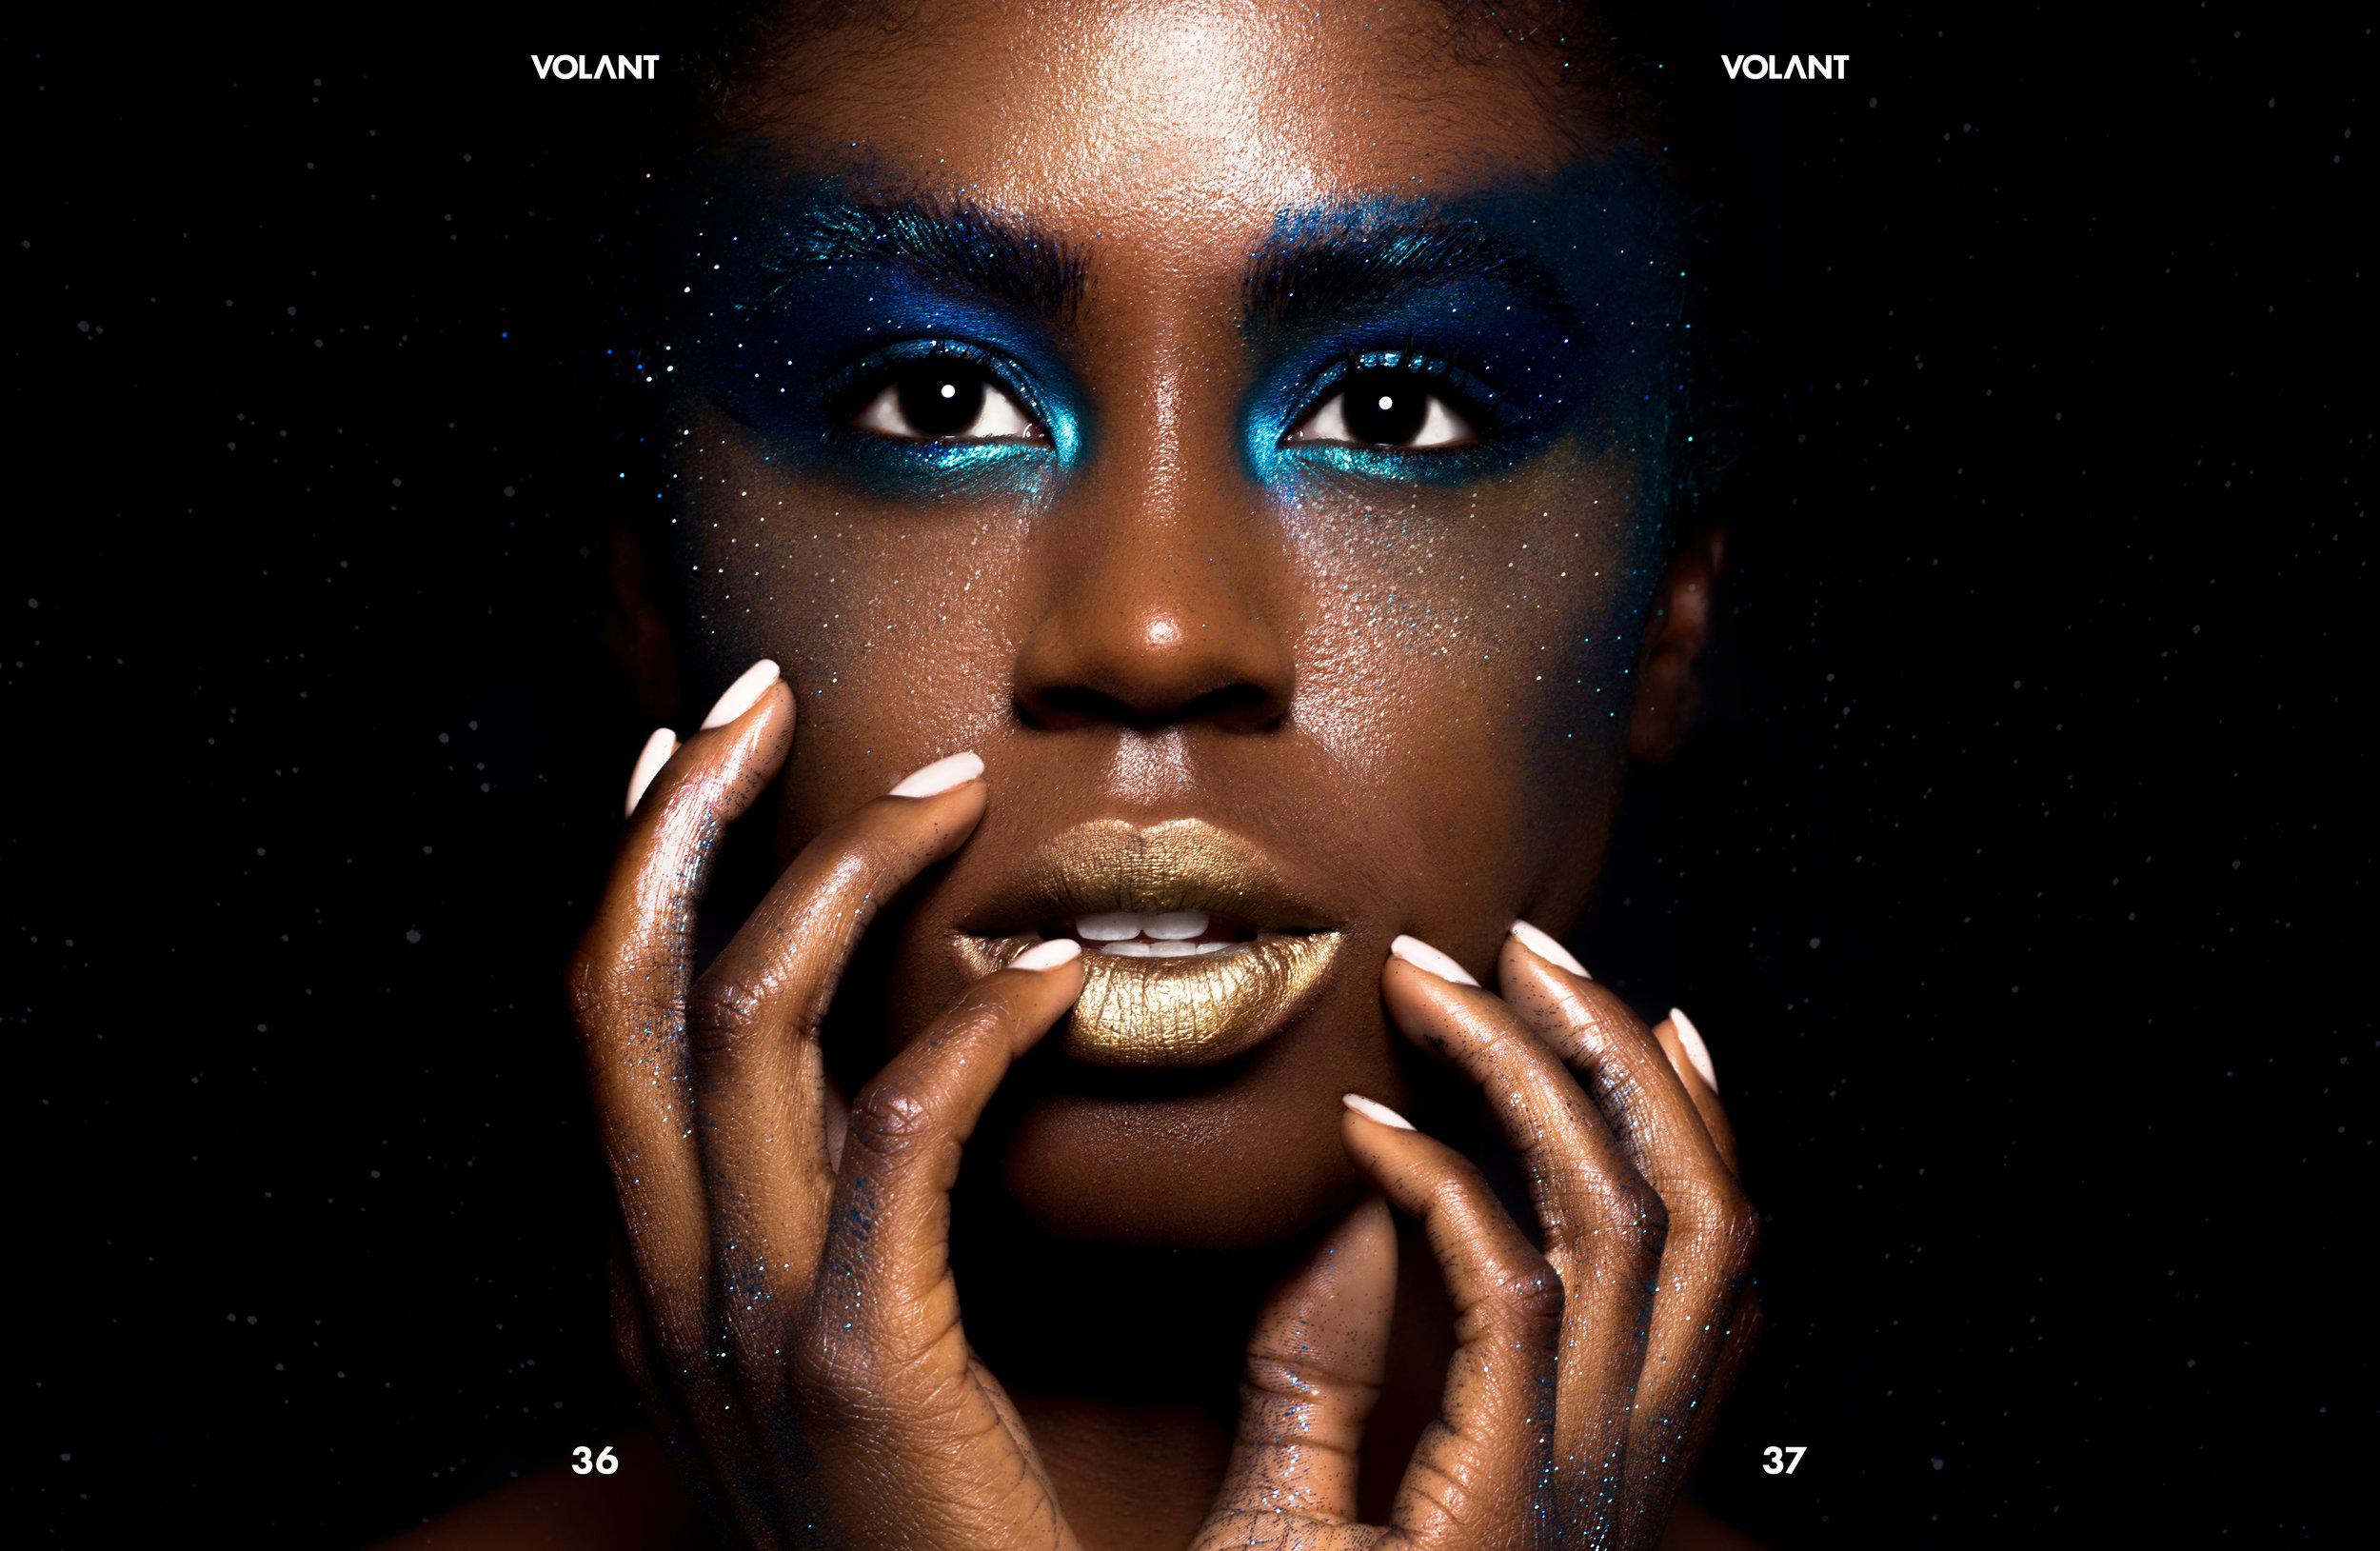 VOLANT_Beauty_Issue_VOL0519.jpg